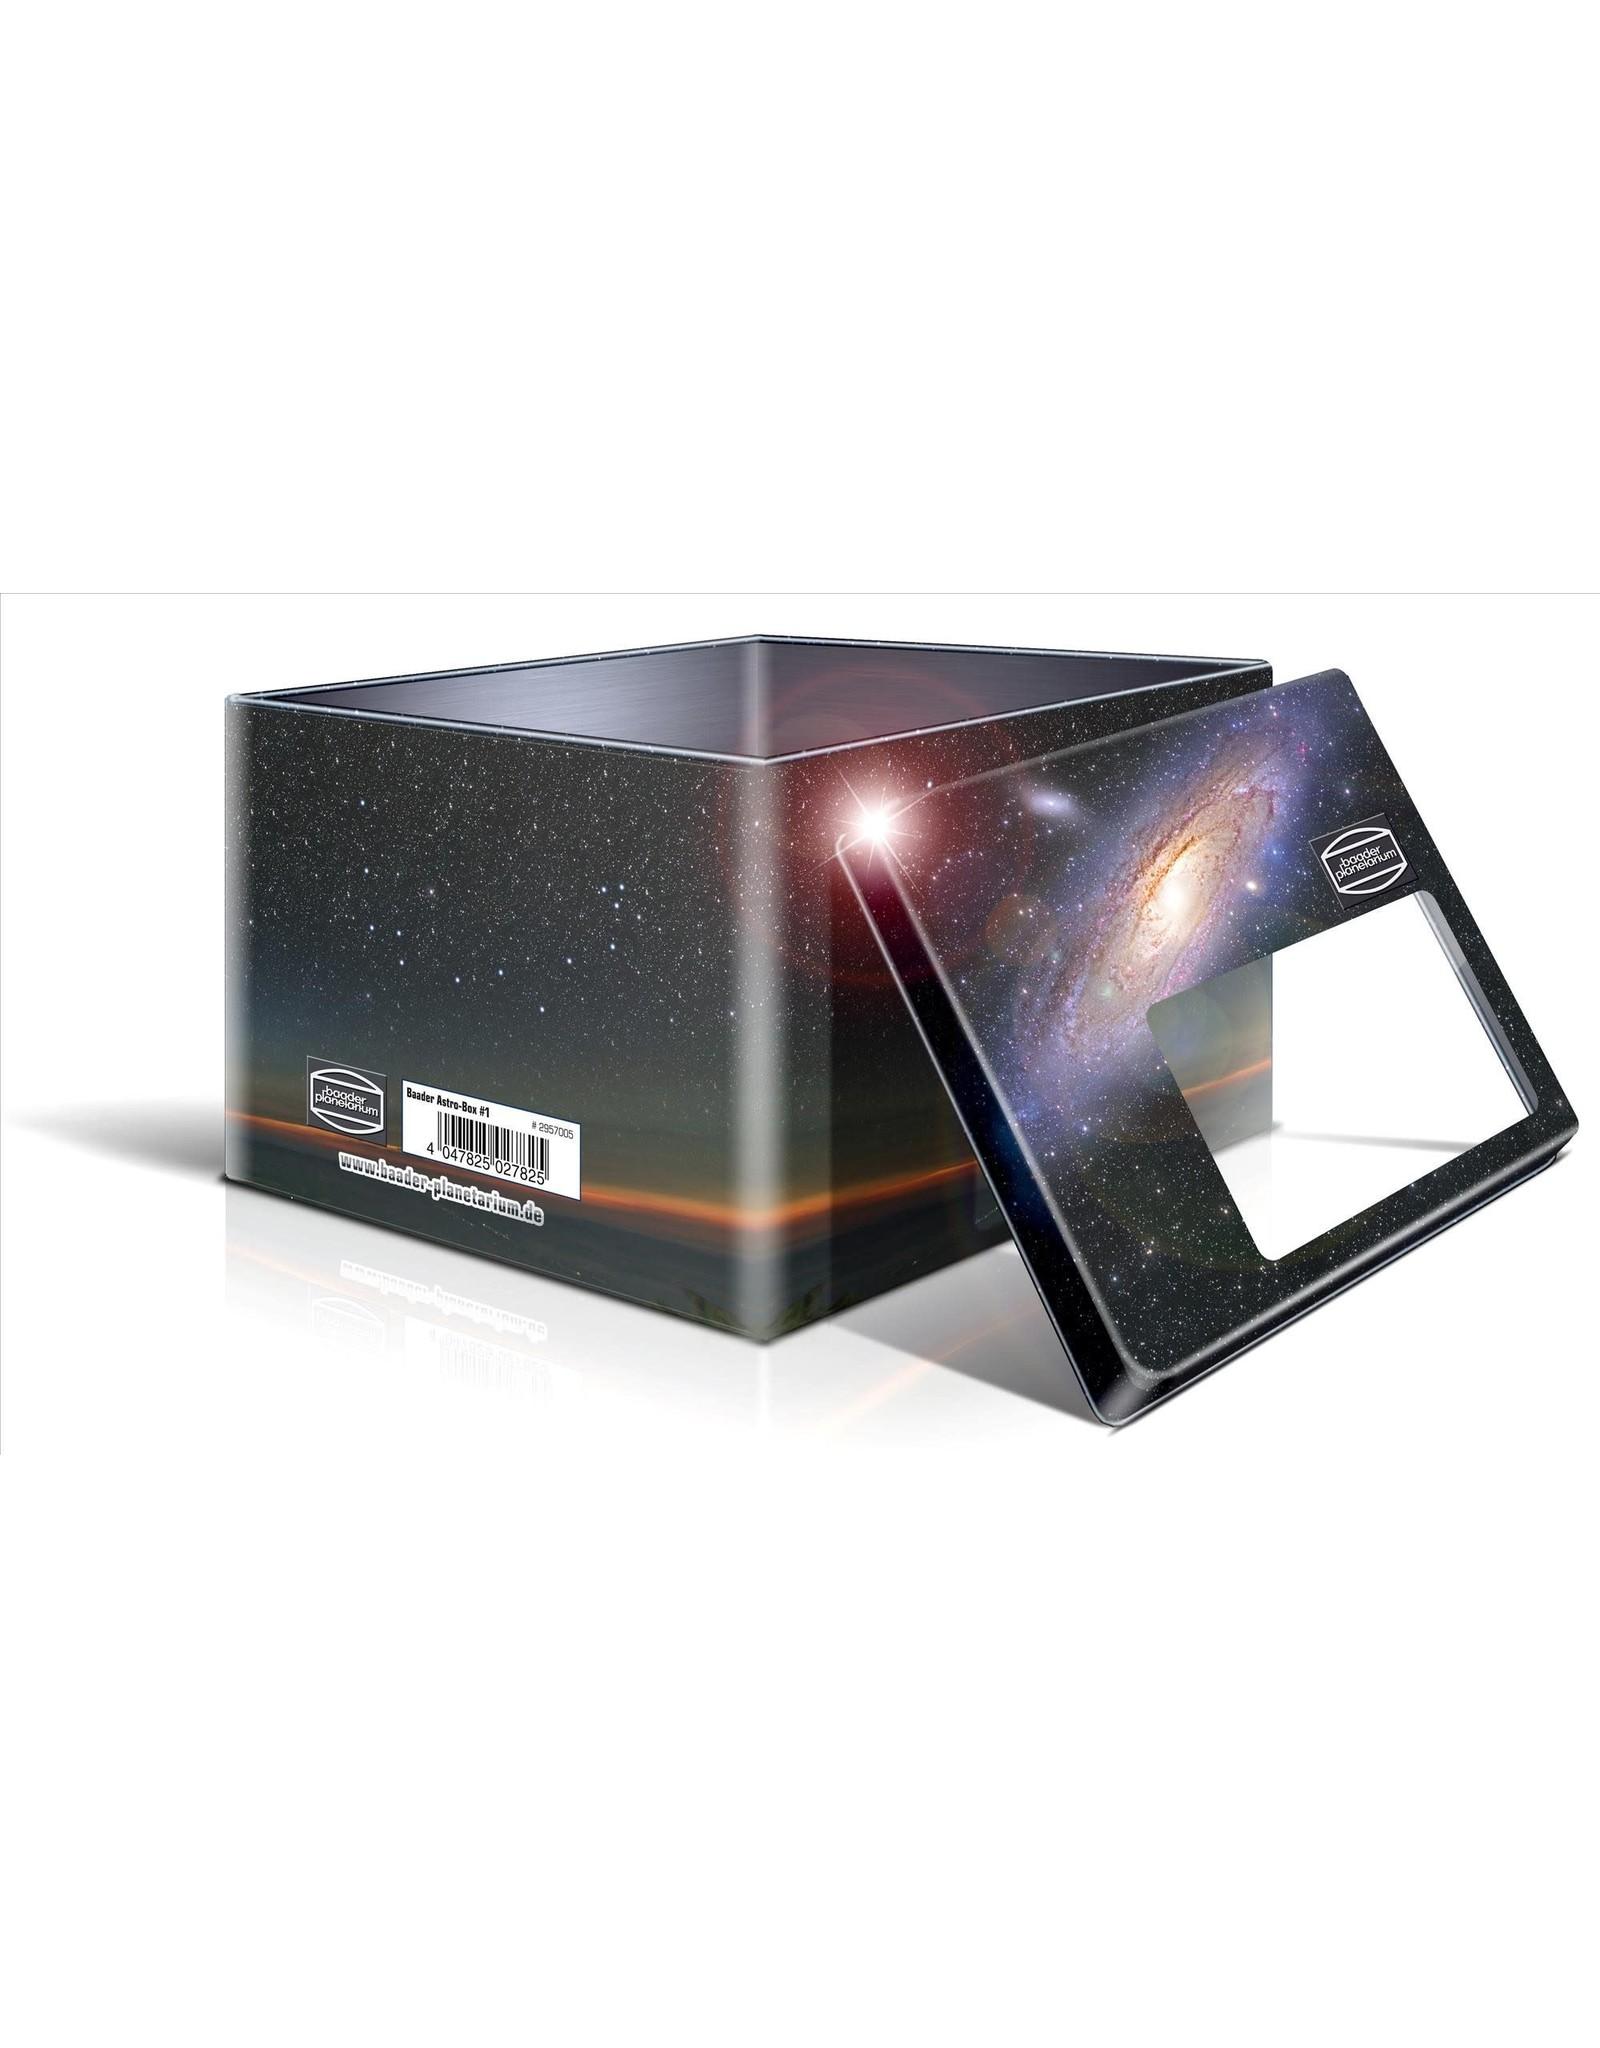 Baader Planetarium Case: Astro-Box#1 (M31) with Window